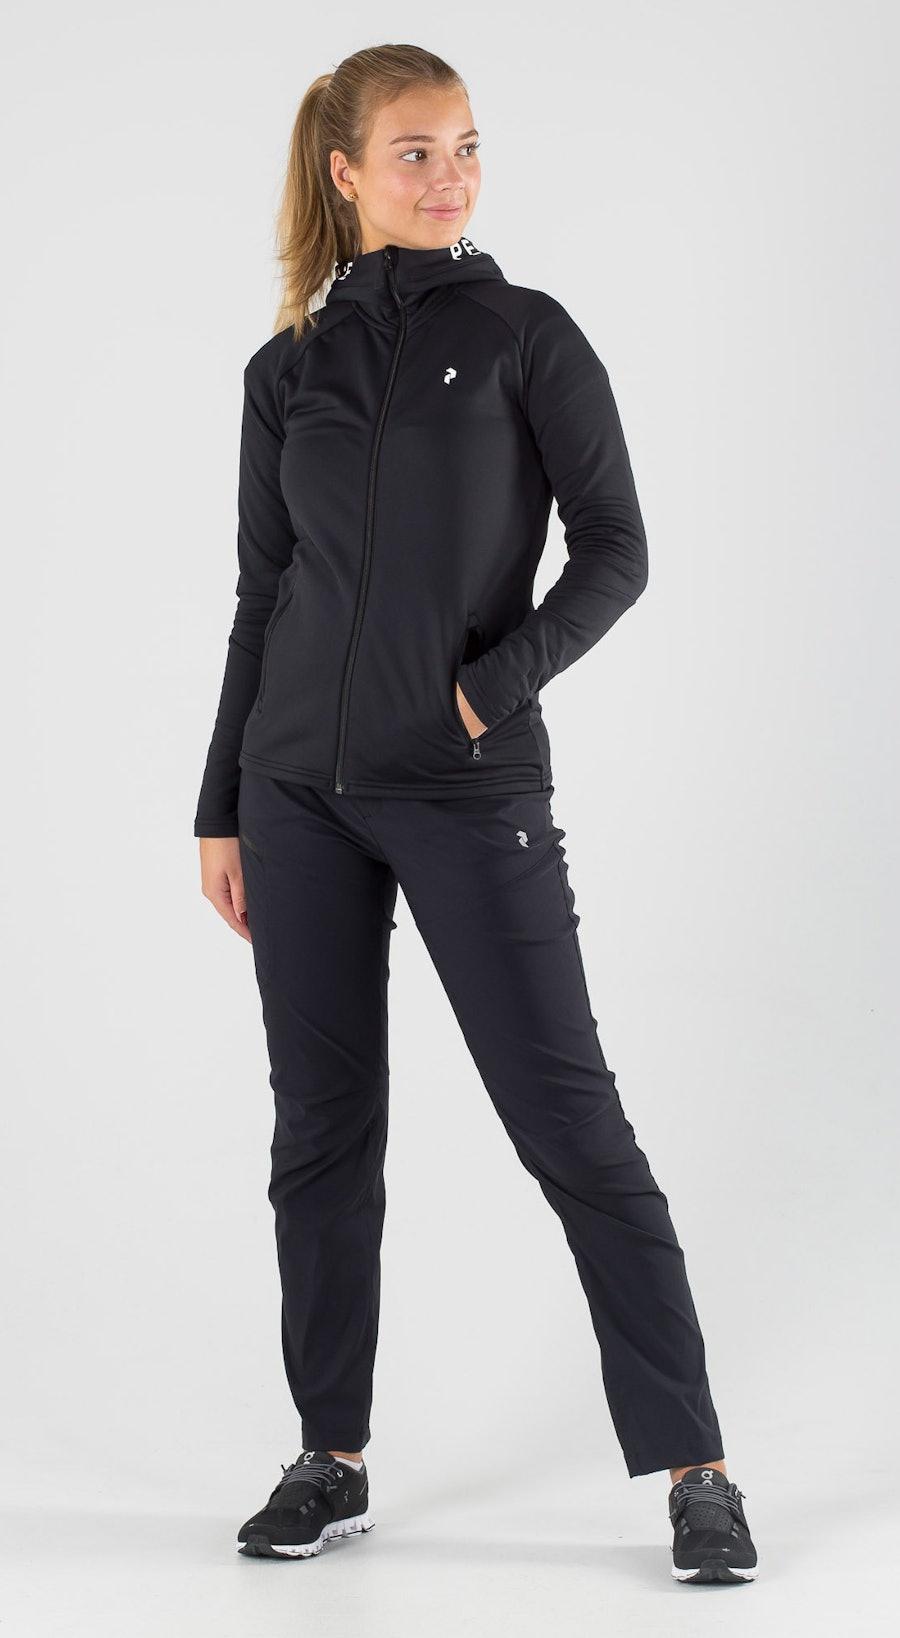 Peak Performance Rider Zip Black Outfit Multi